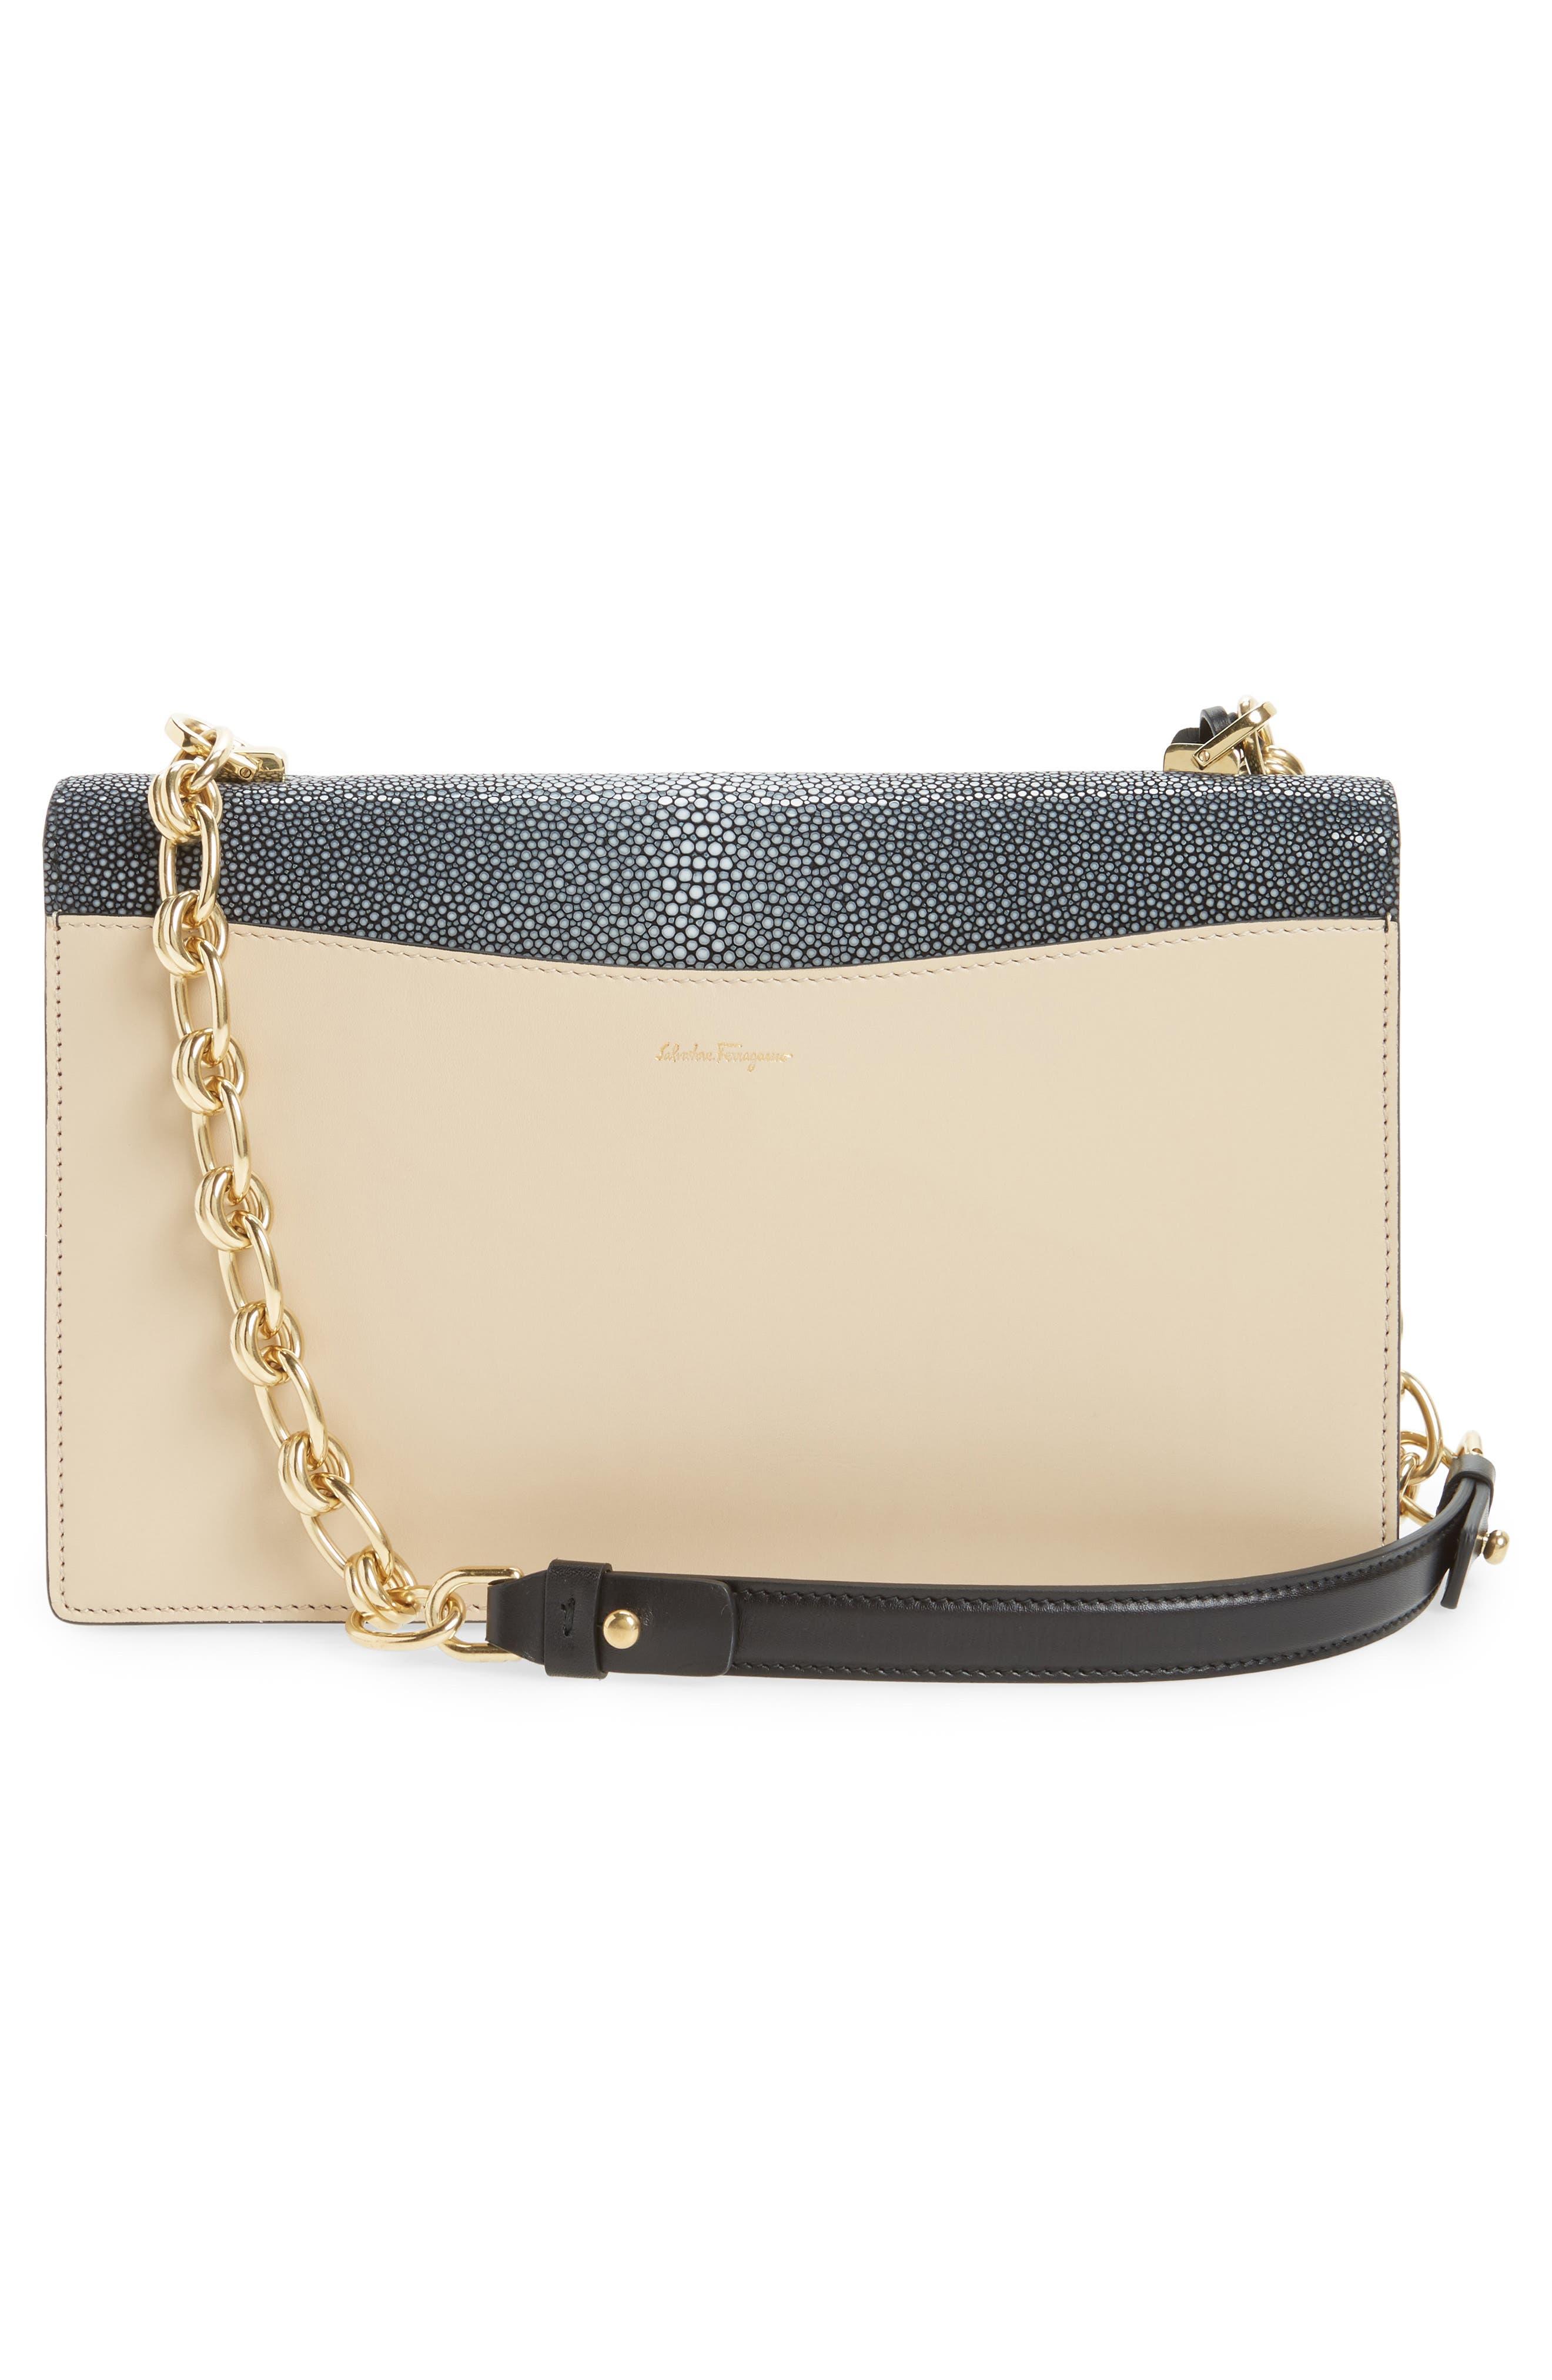 Alternate Image 3  - Salvatore Ferragamo Stingray Leather Shoulder Bag